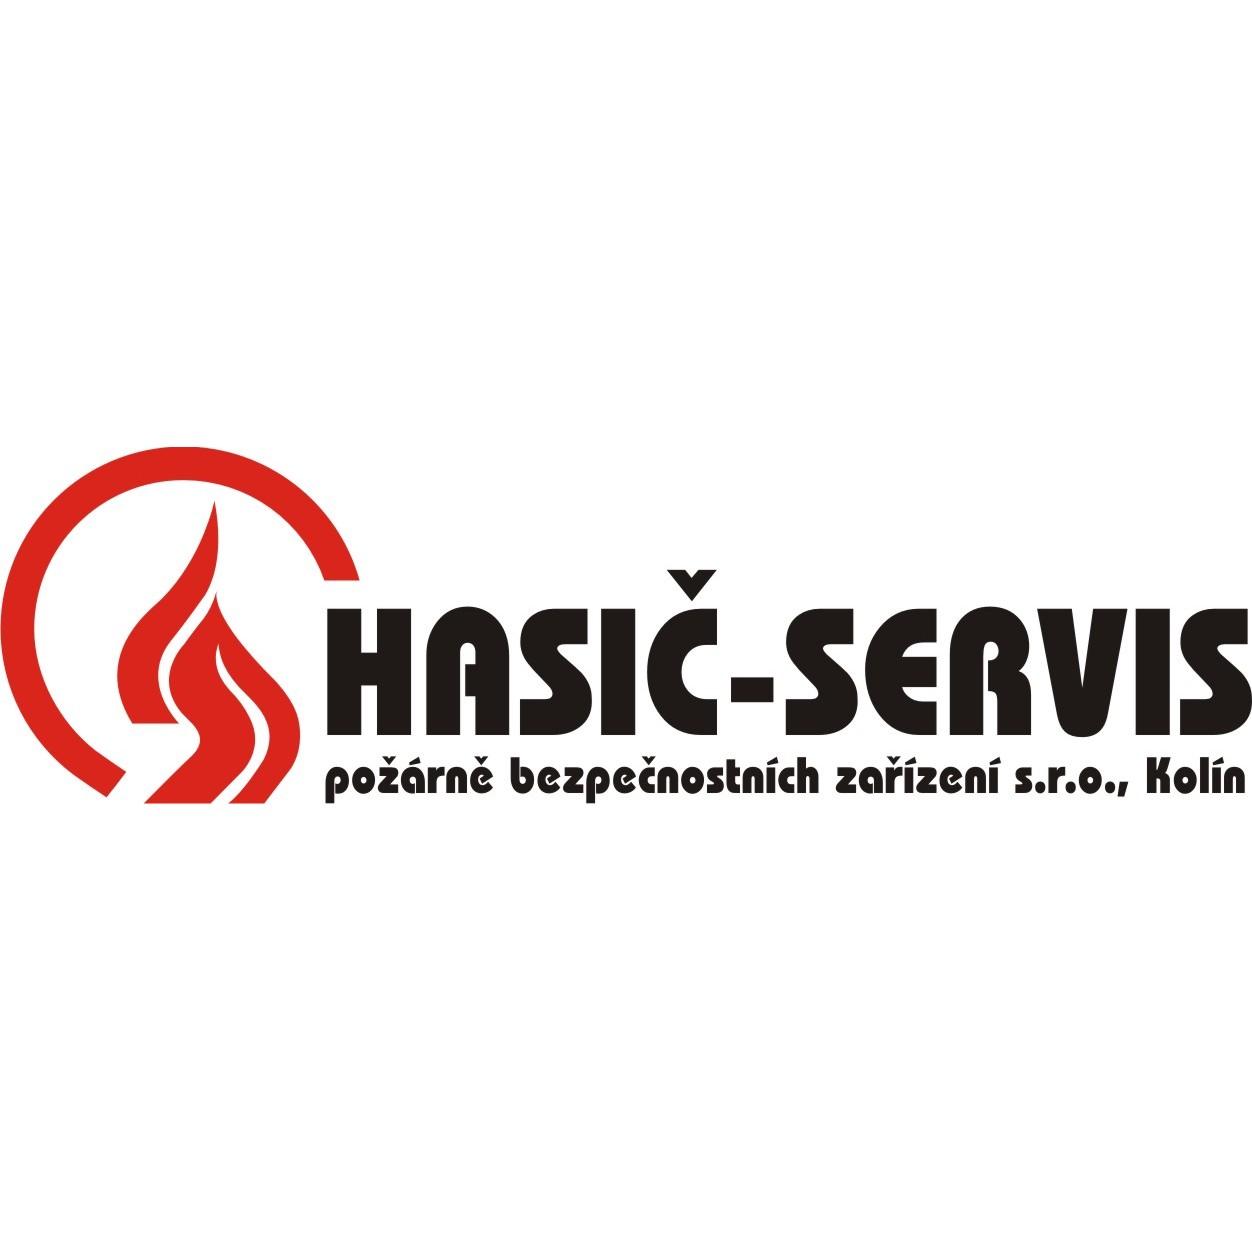 Hasič - SERVIS PBZ s.r.o. - Petr Malý, Vladimír Mühl